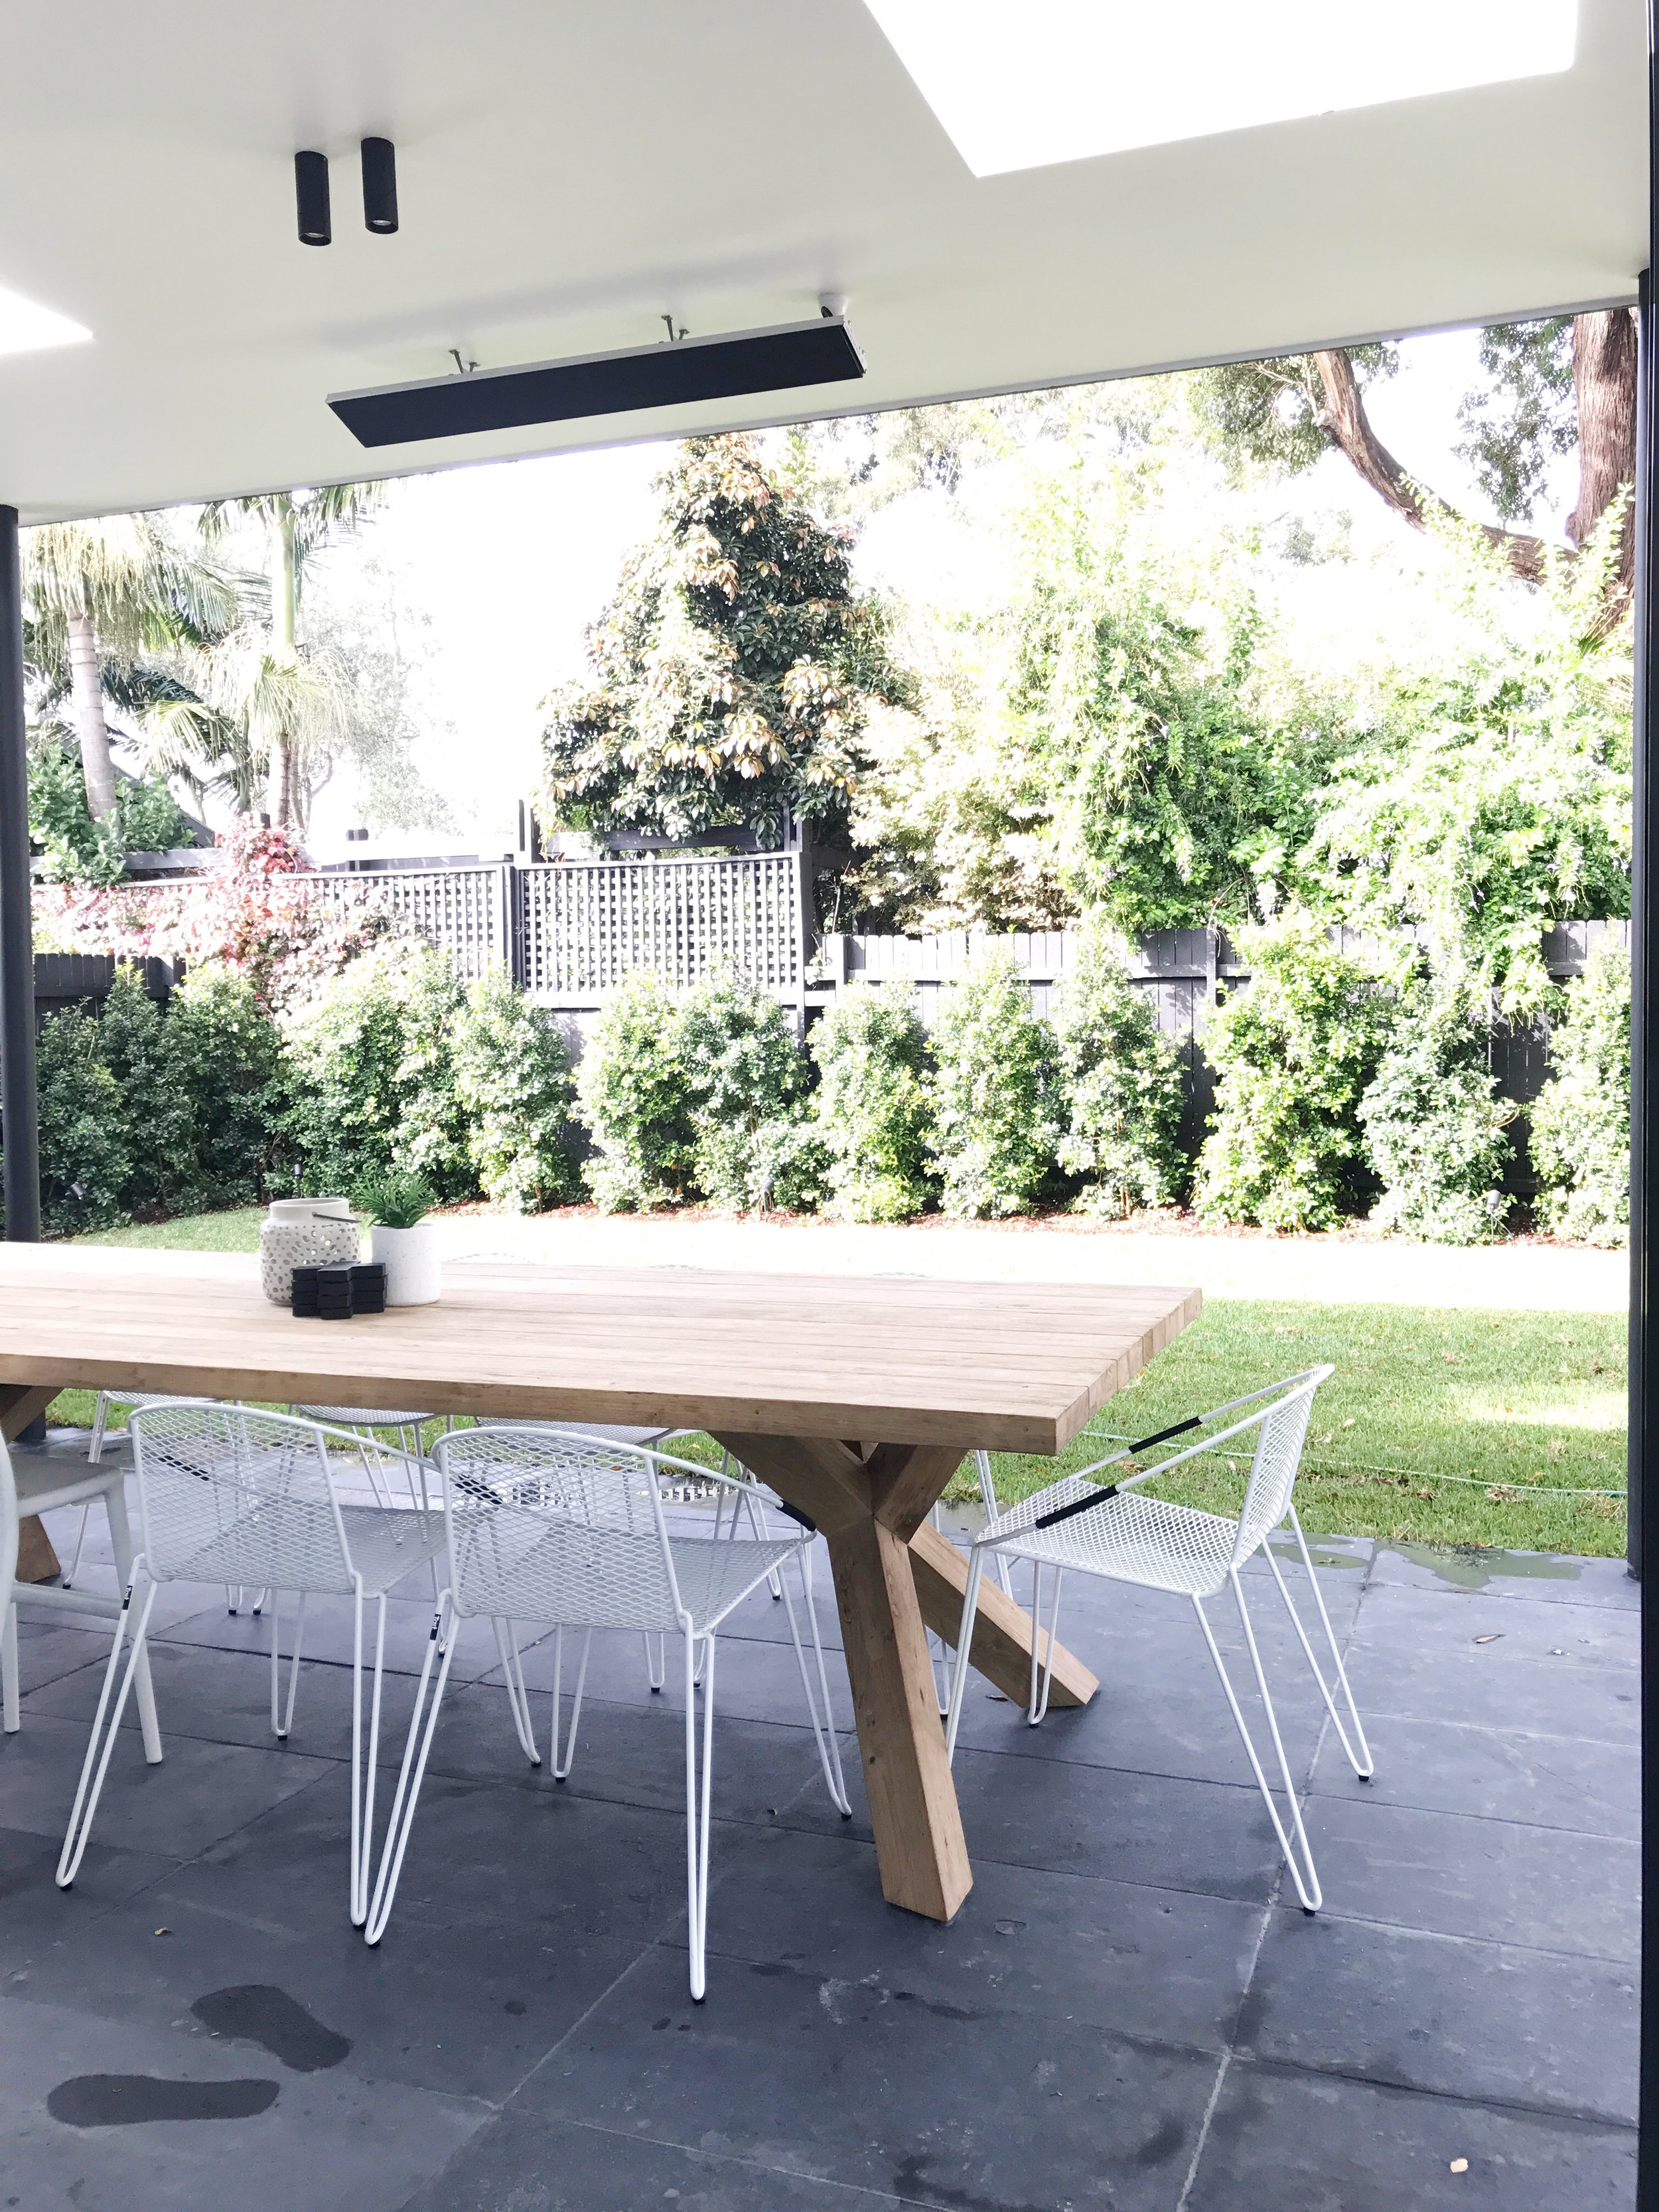 Back garden - patio area.JPG